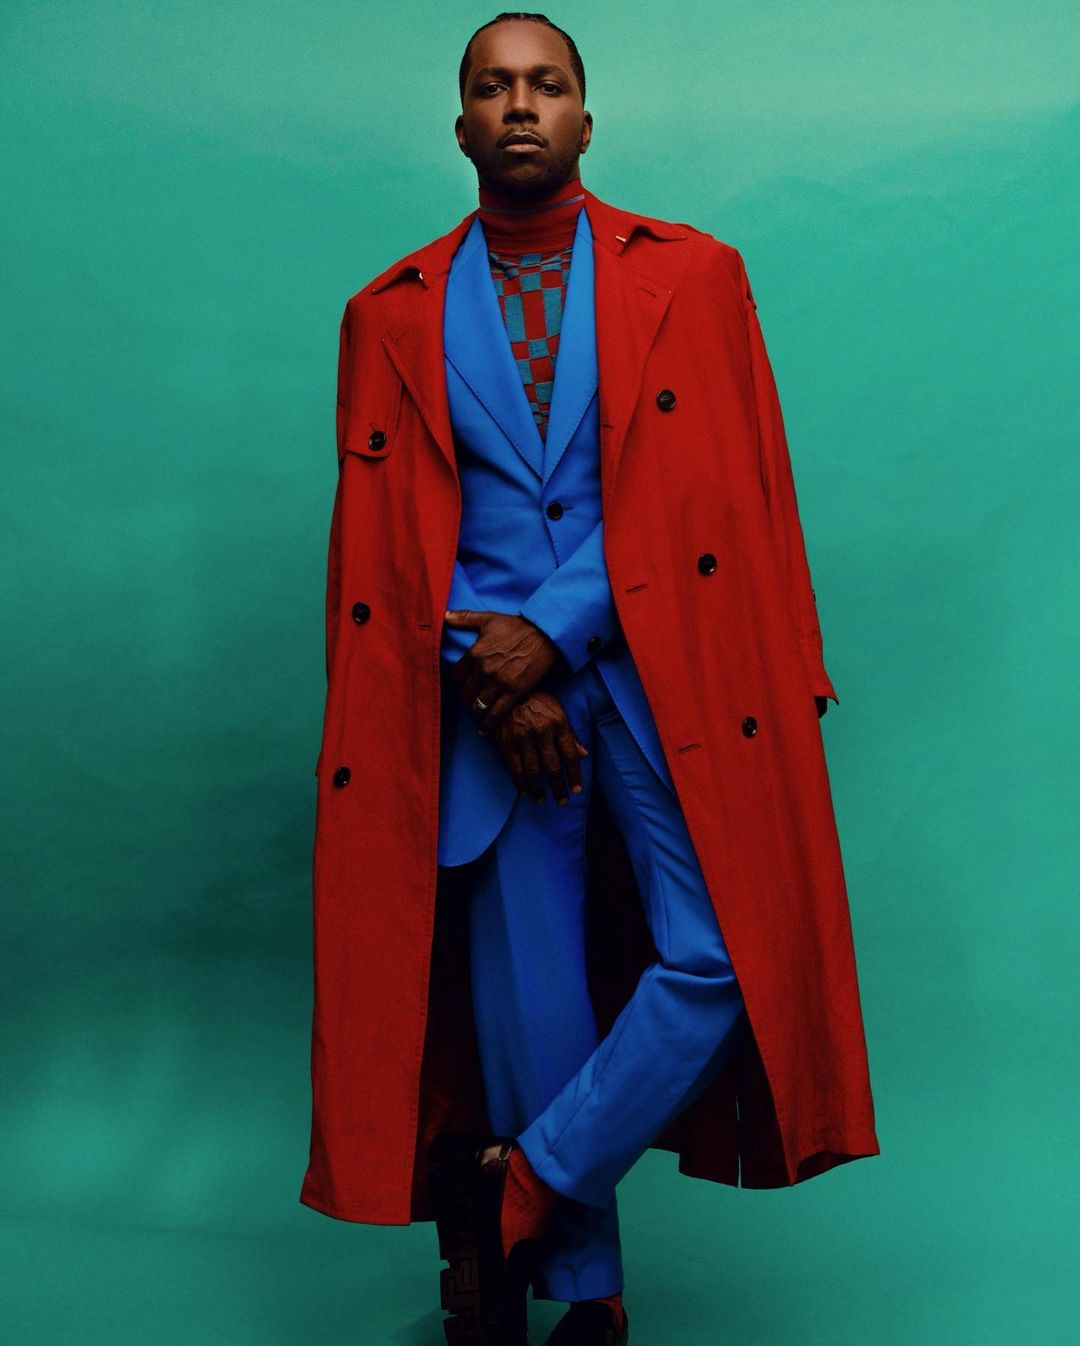 Standout Men's Red Carpet Looks During Awards Season